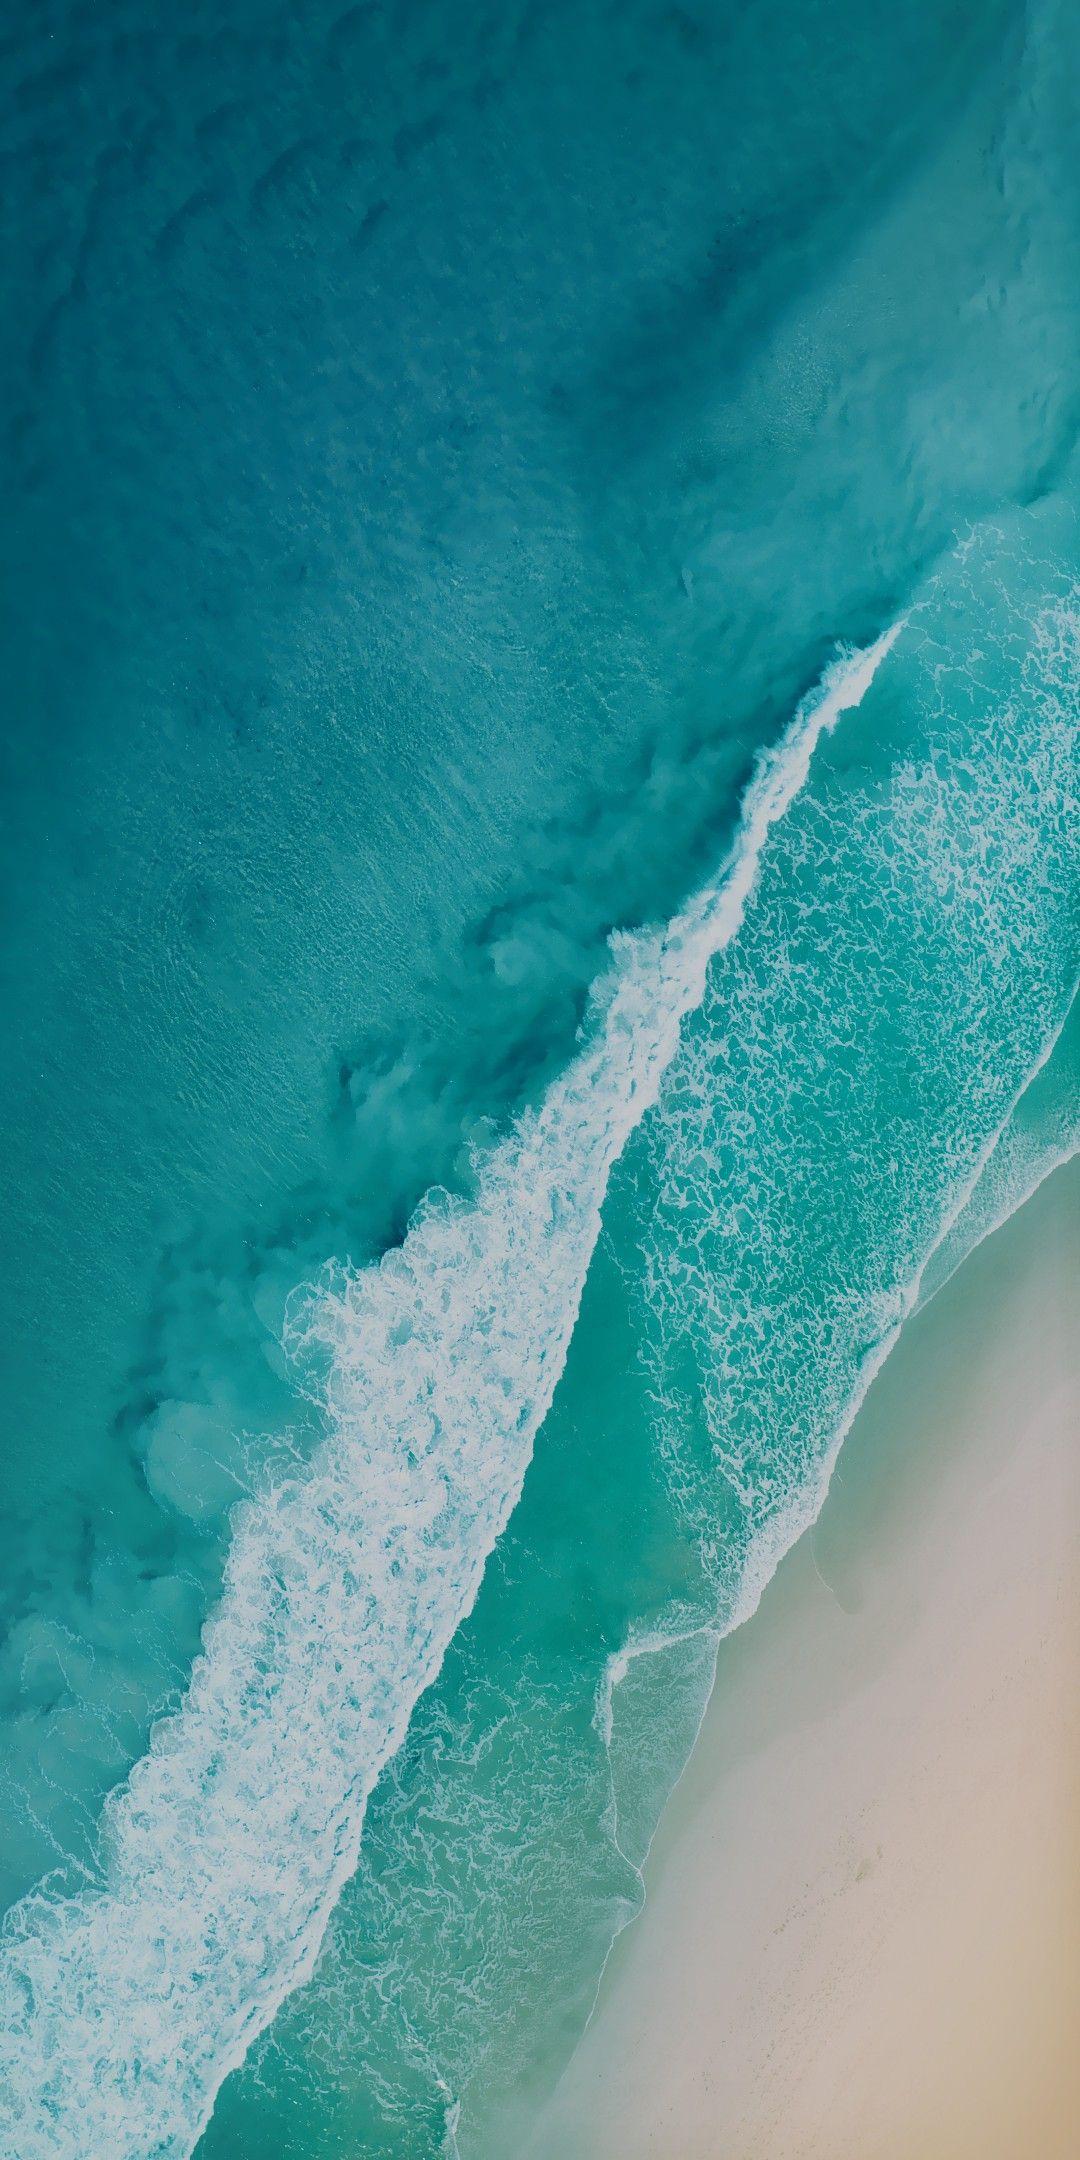 Pin by Zoe Daniels on DARK AND DULL in 2019   Ocean ...